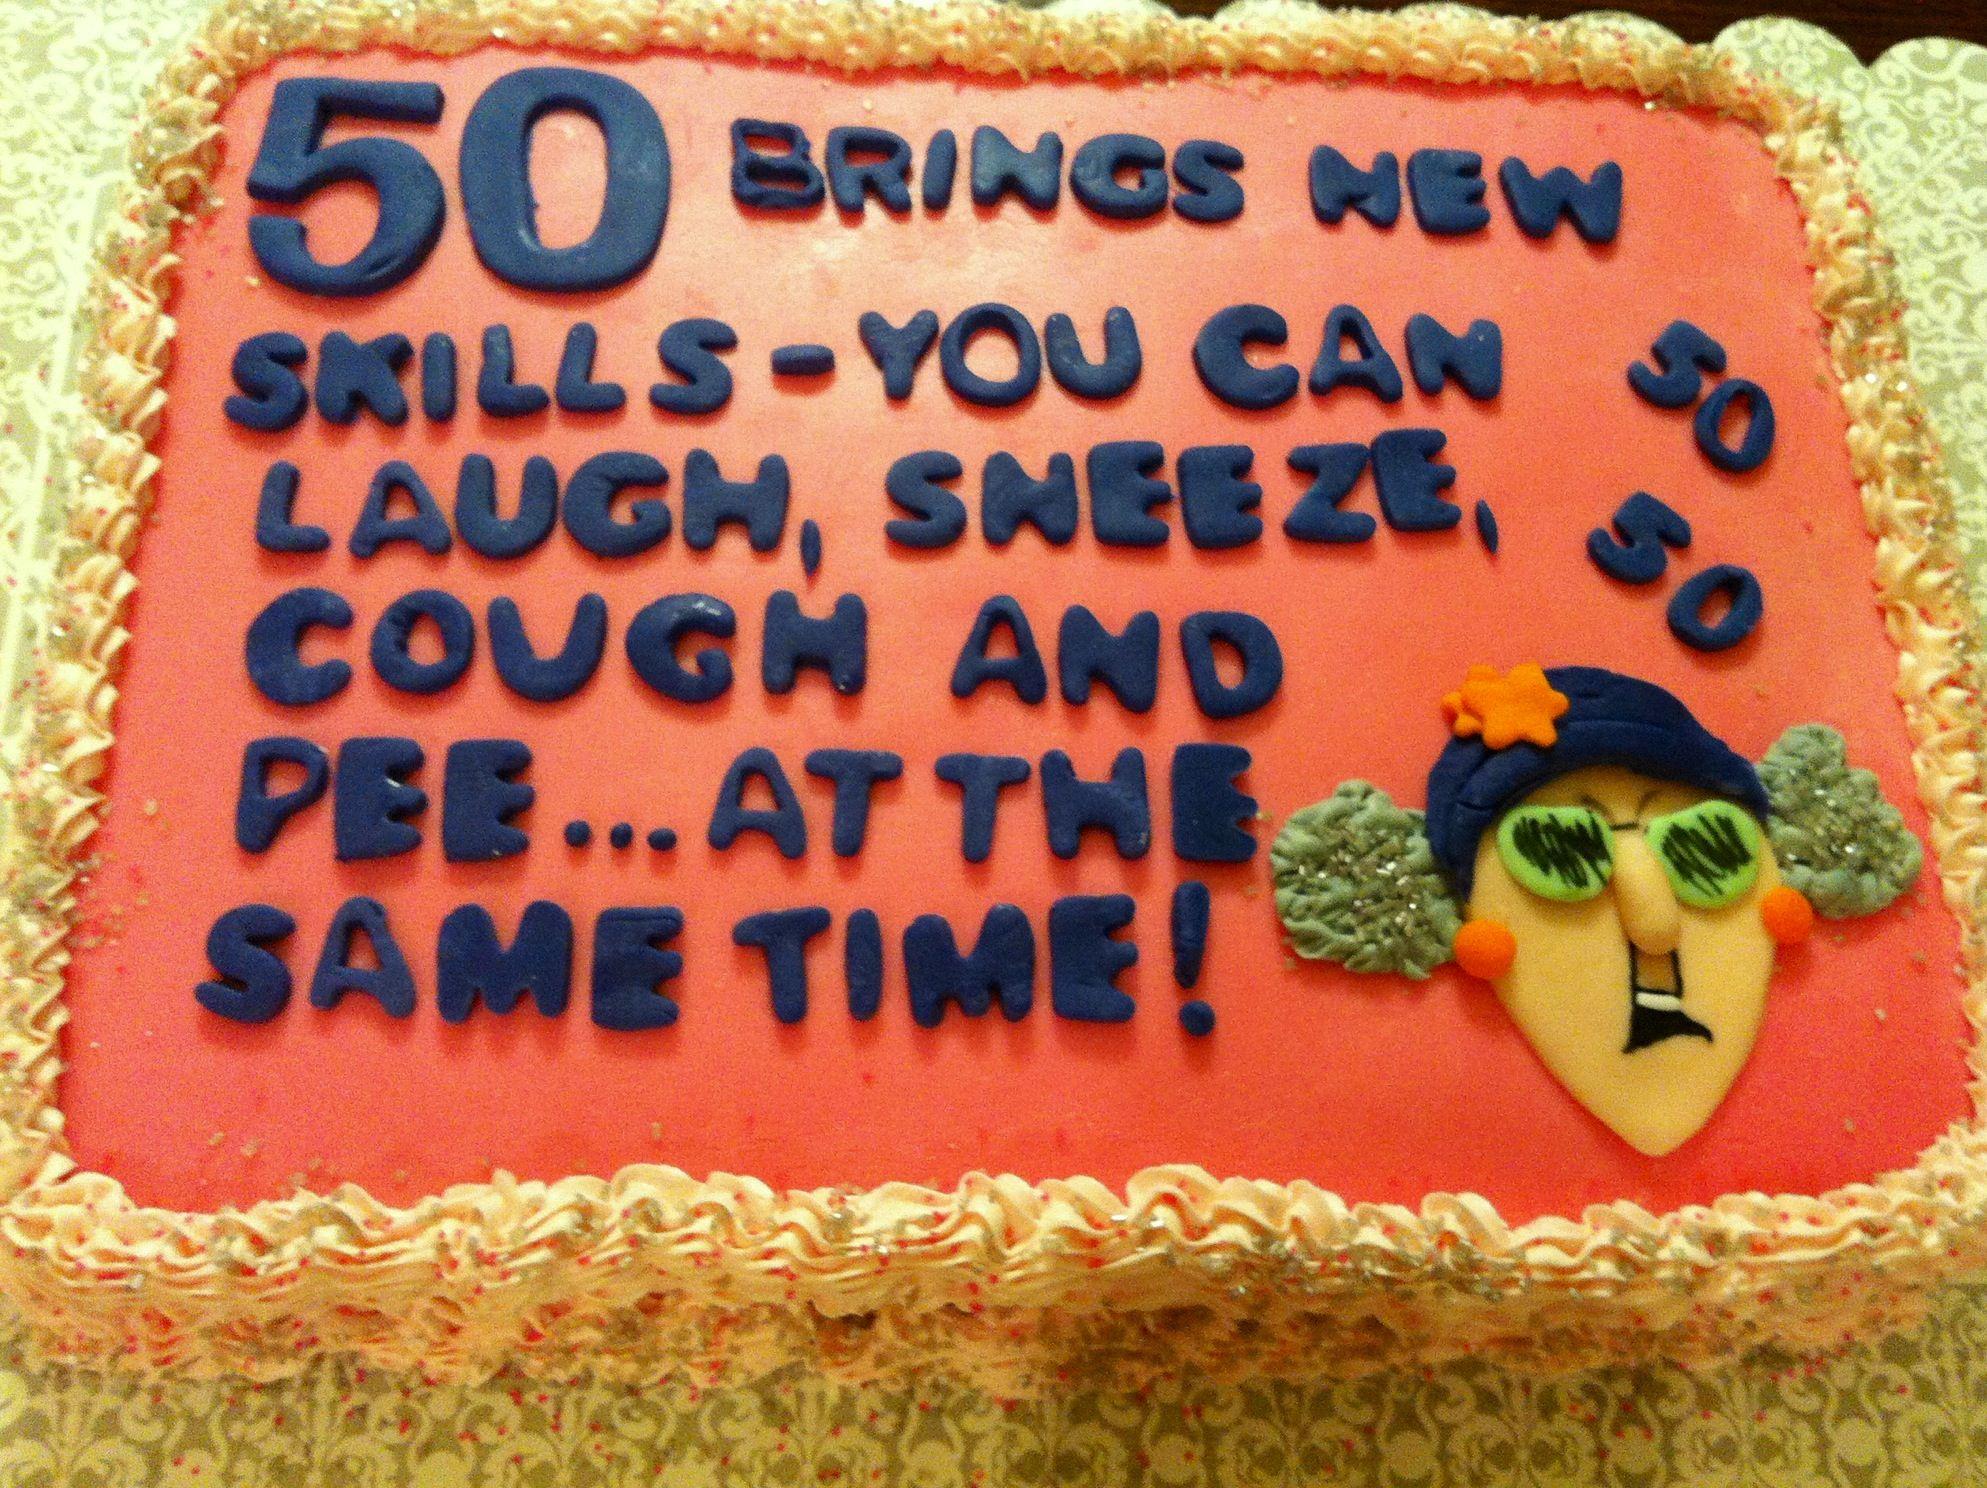 50th Birthday Cake Cakes by Pam Pinterest Birthday cakes